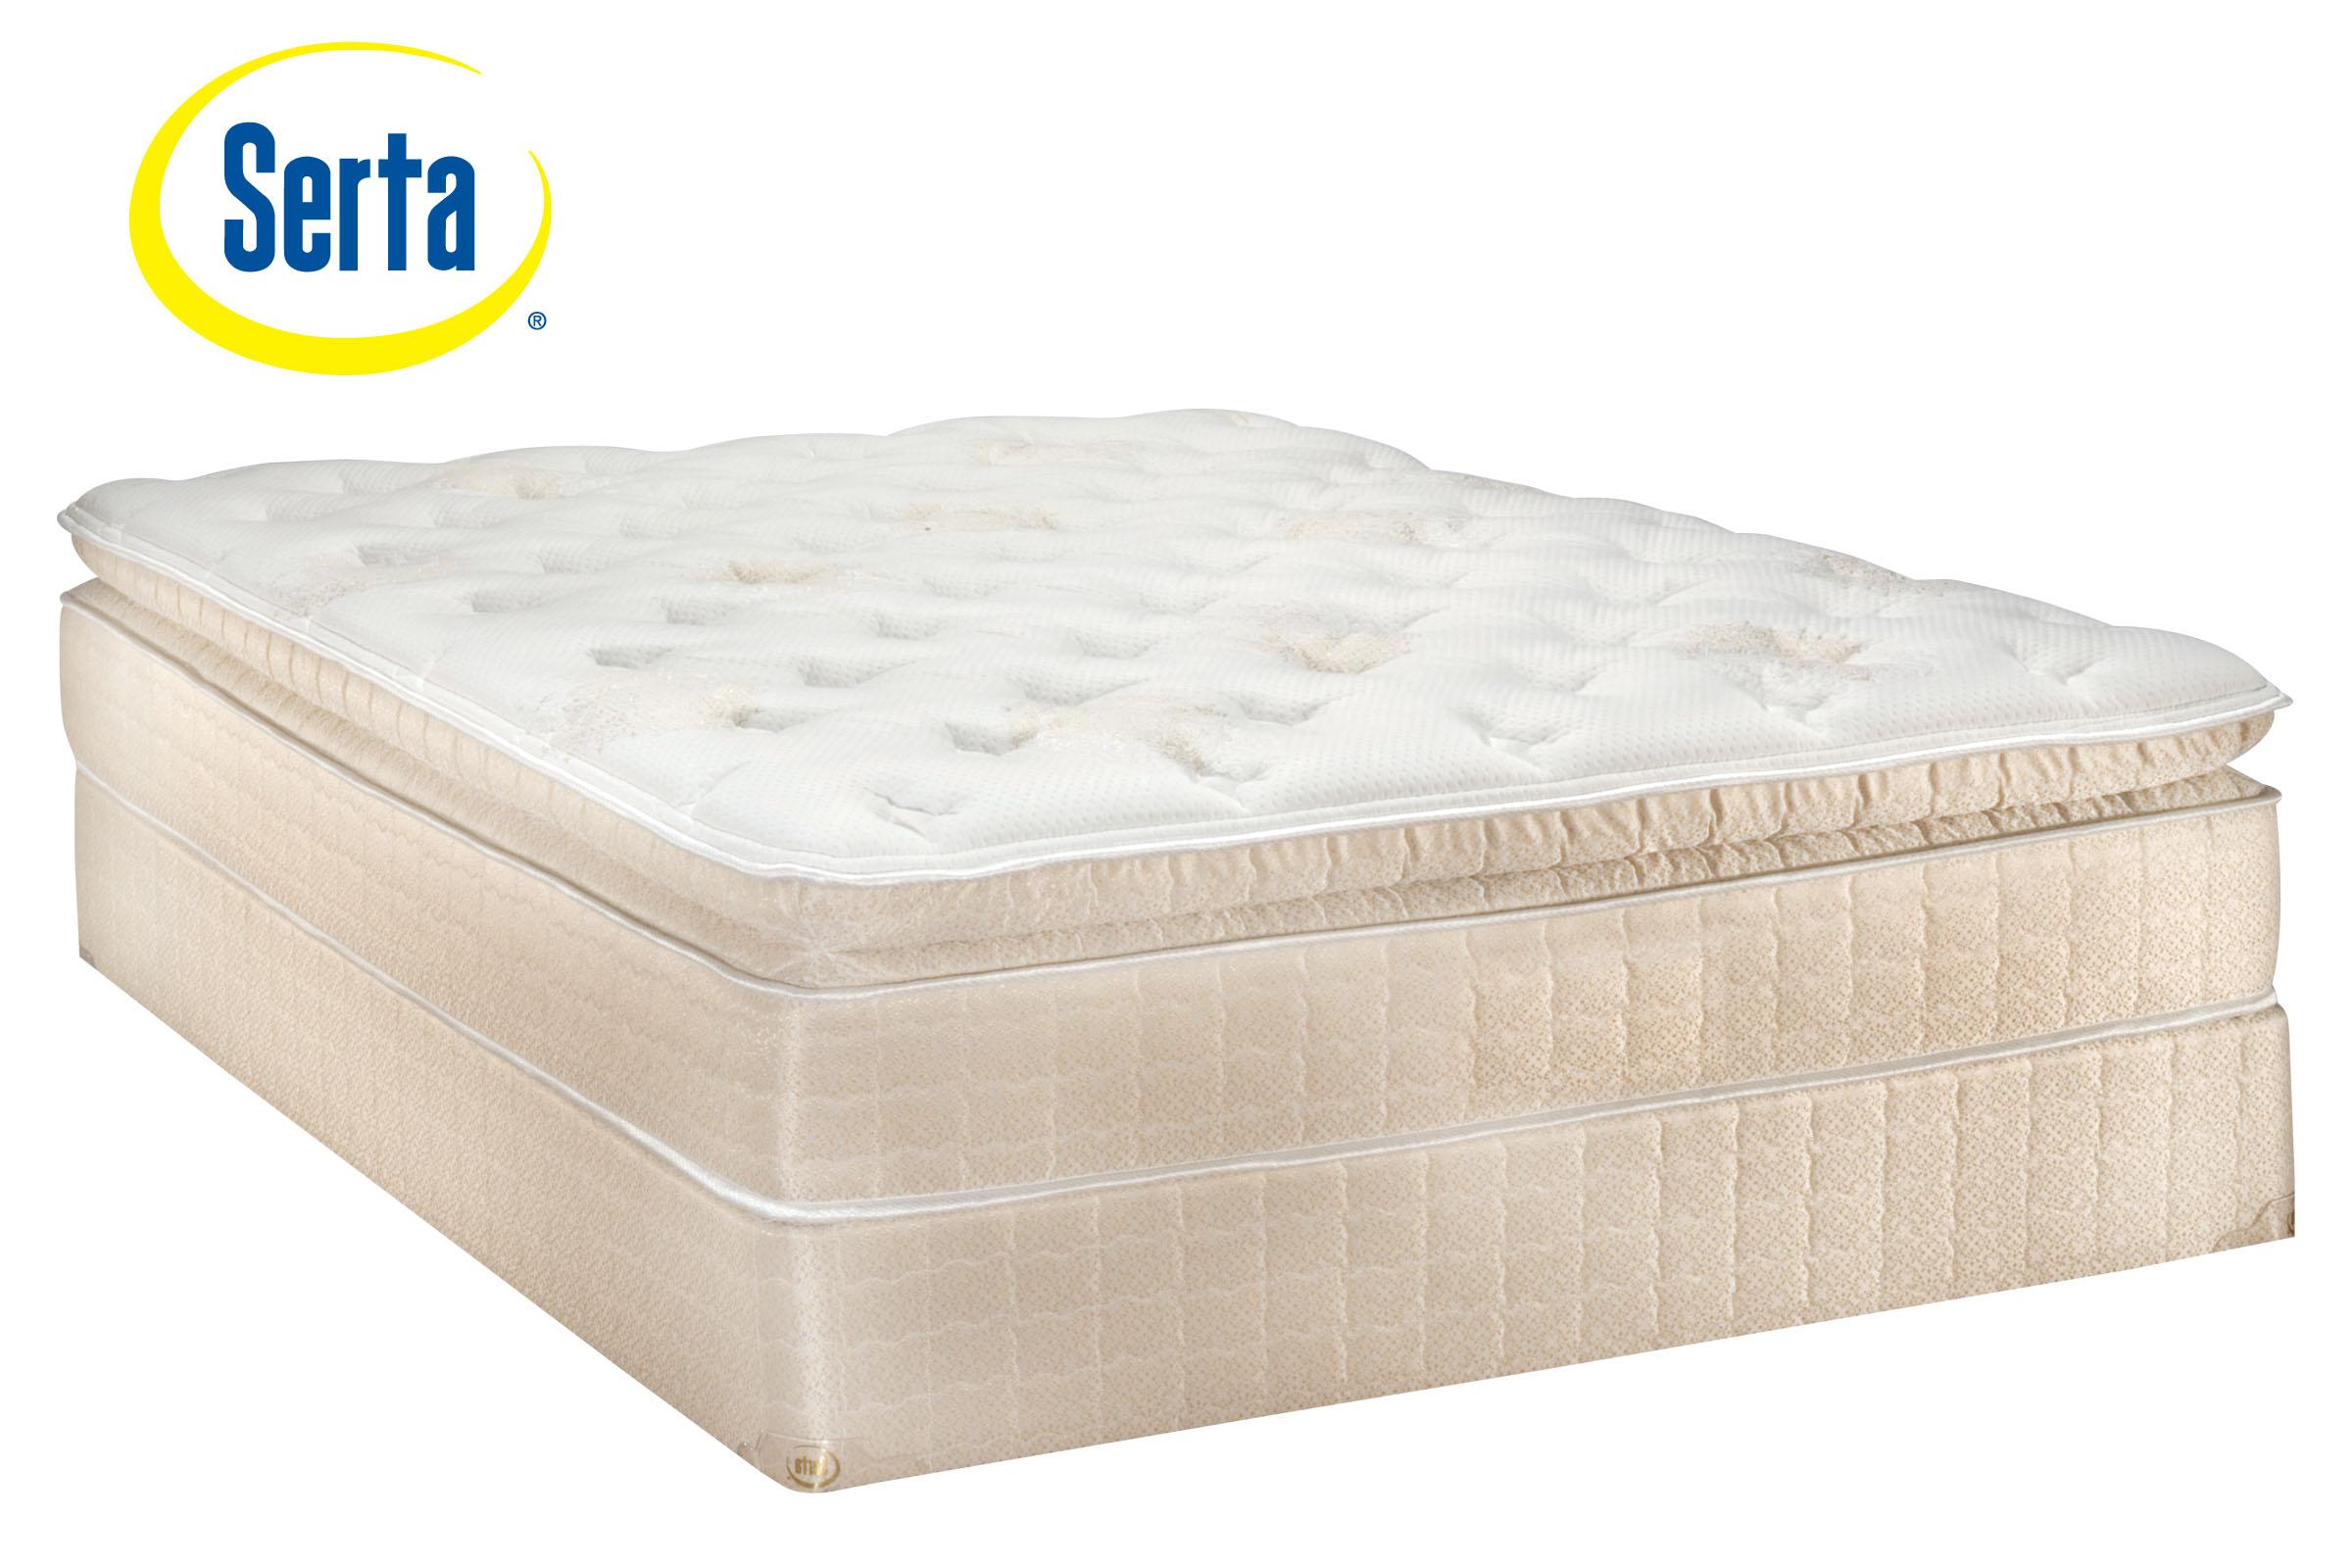 serta perfect outlet top tampa discount super mattress grandis sleeper pillow